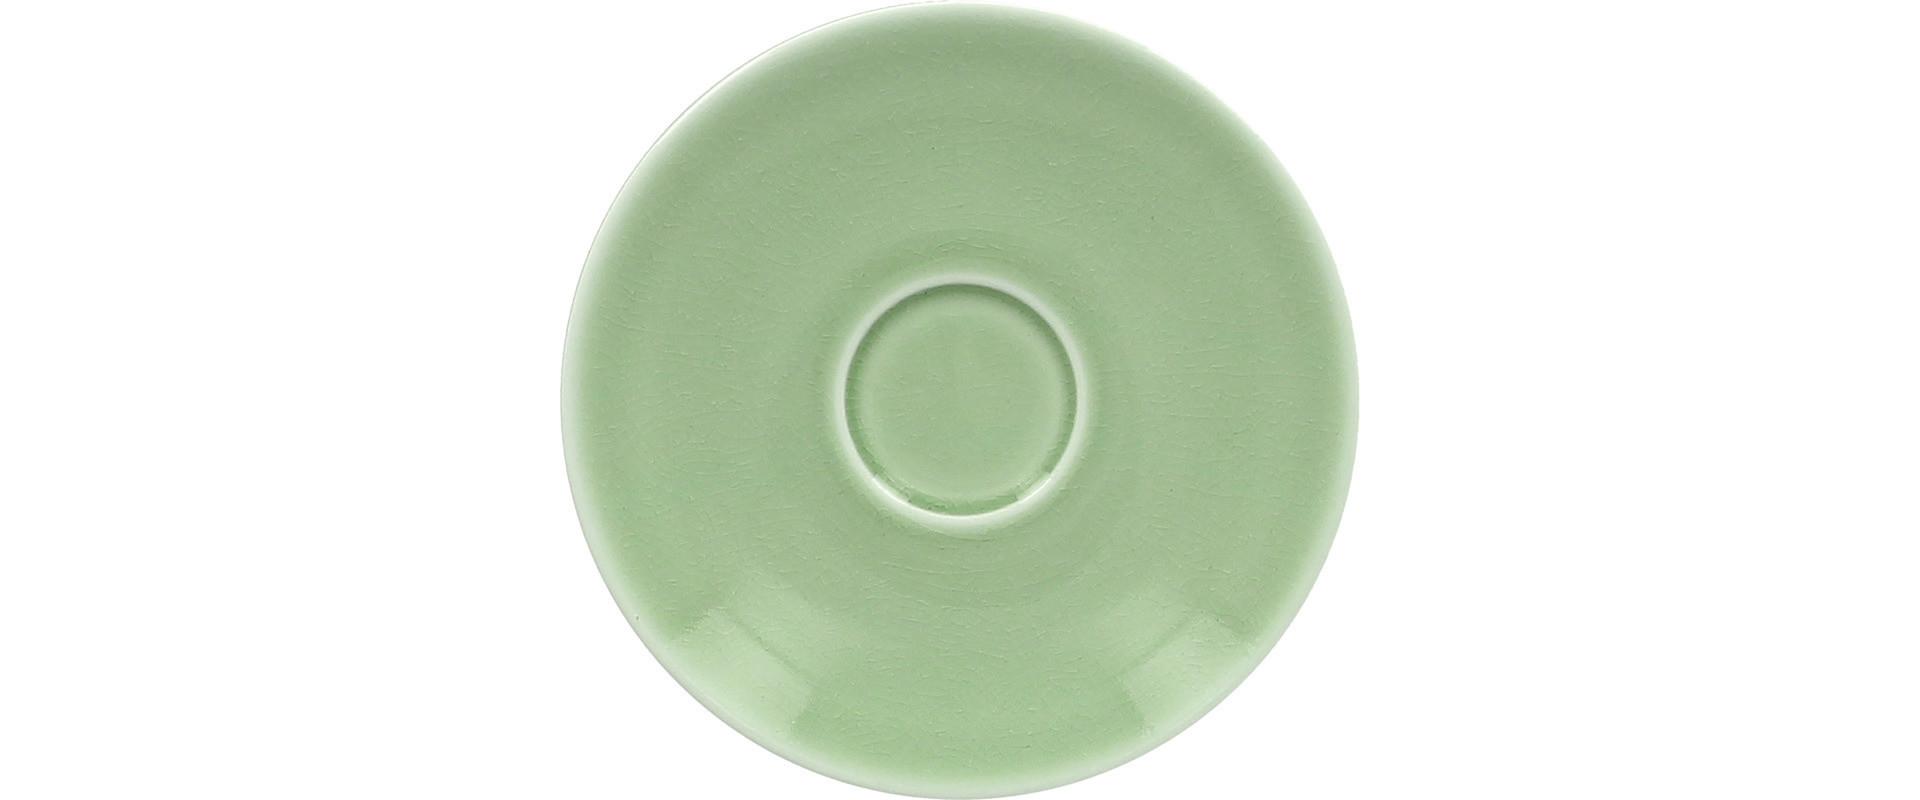 Vintage, Kaffee-Untertasse ø 150 mm plain-green